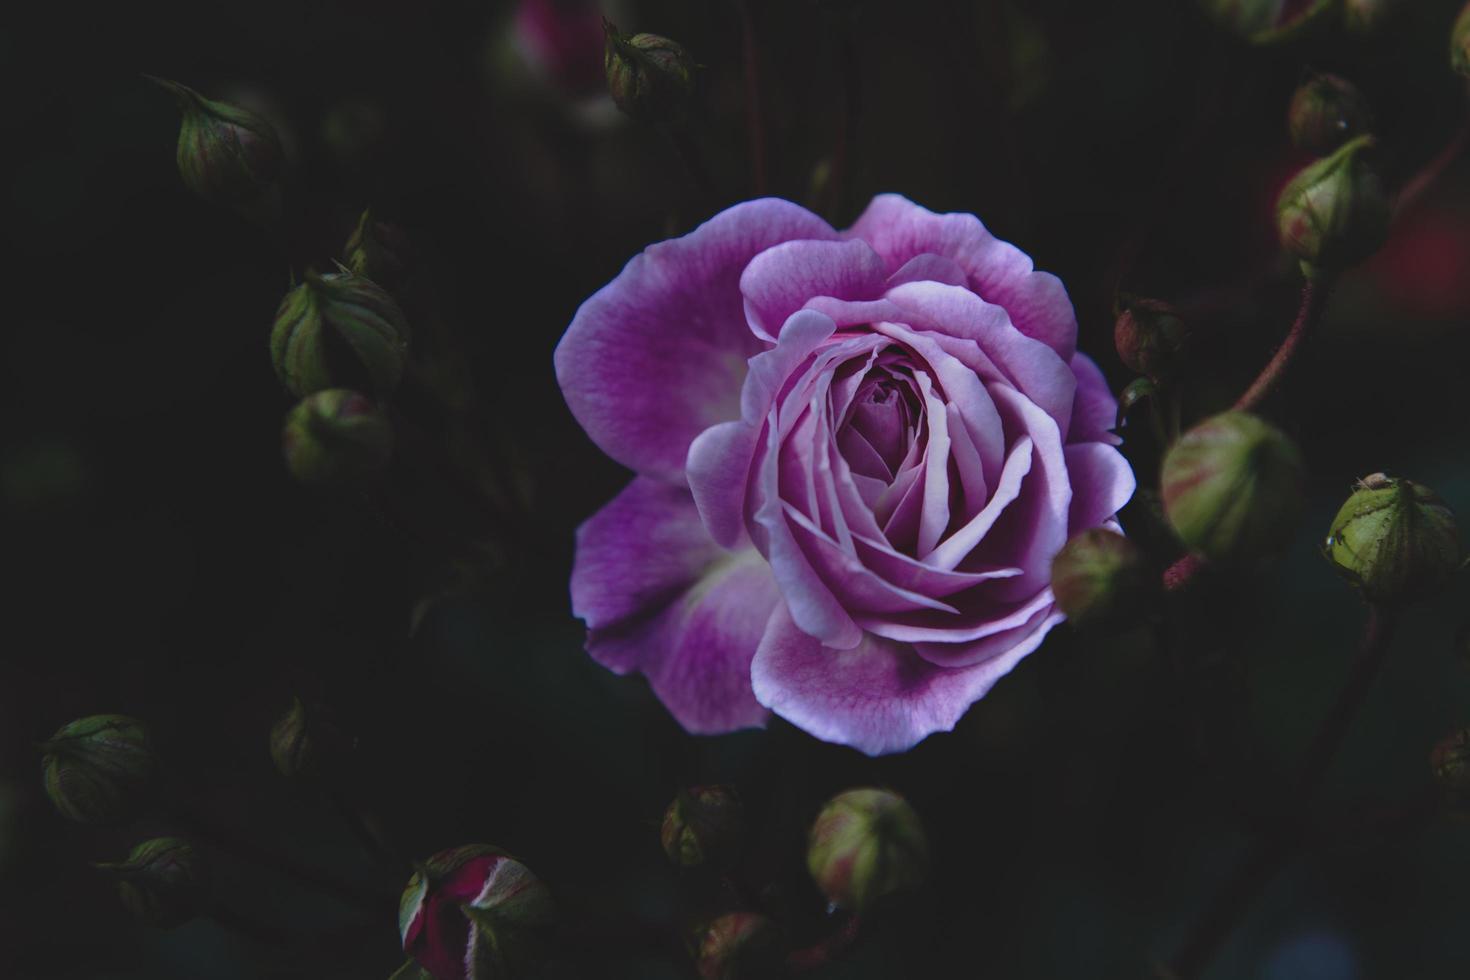 Close-up of purple rose photo